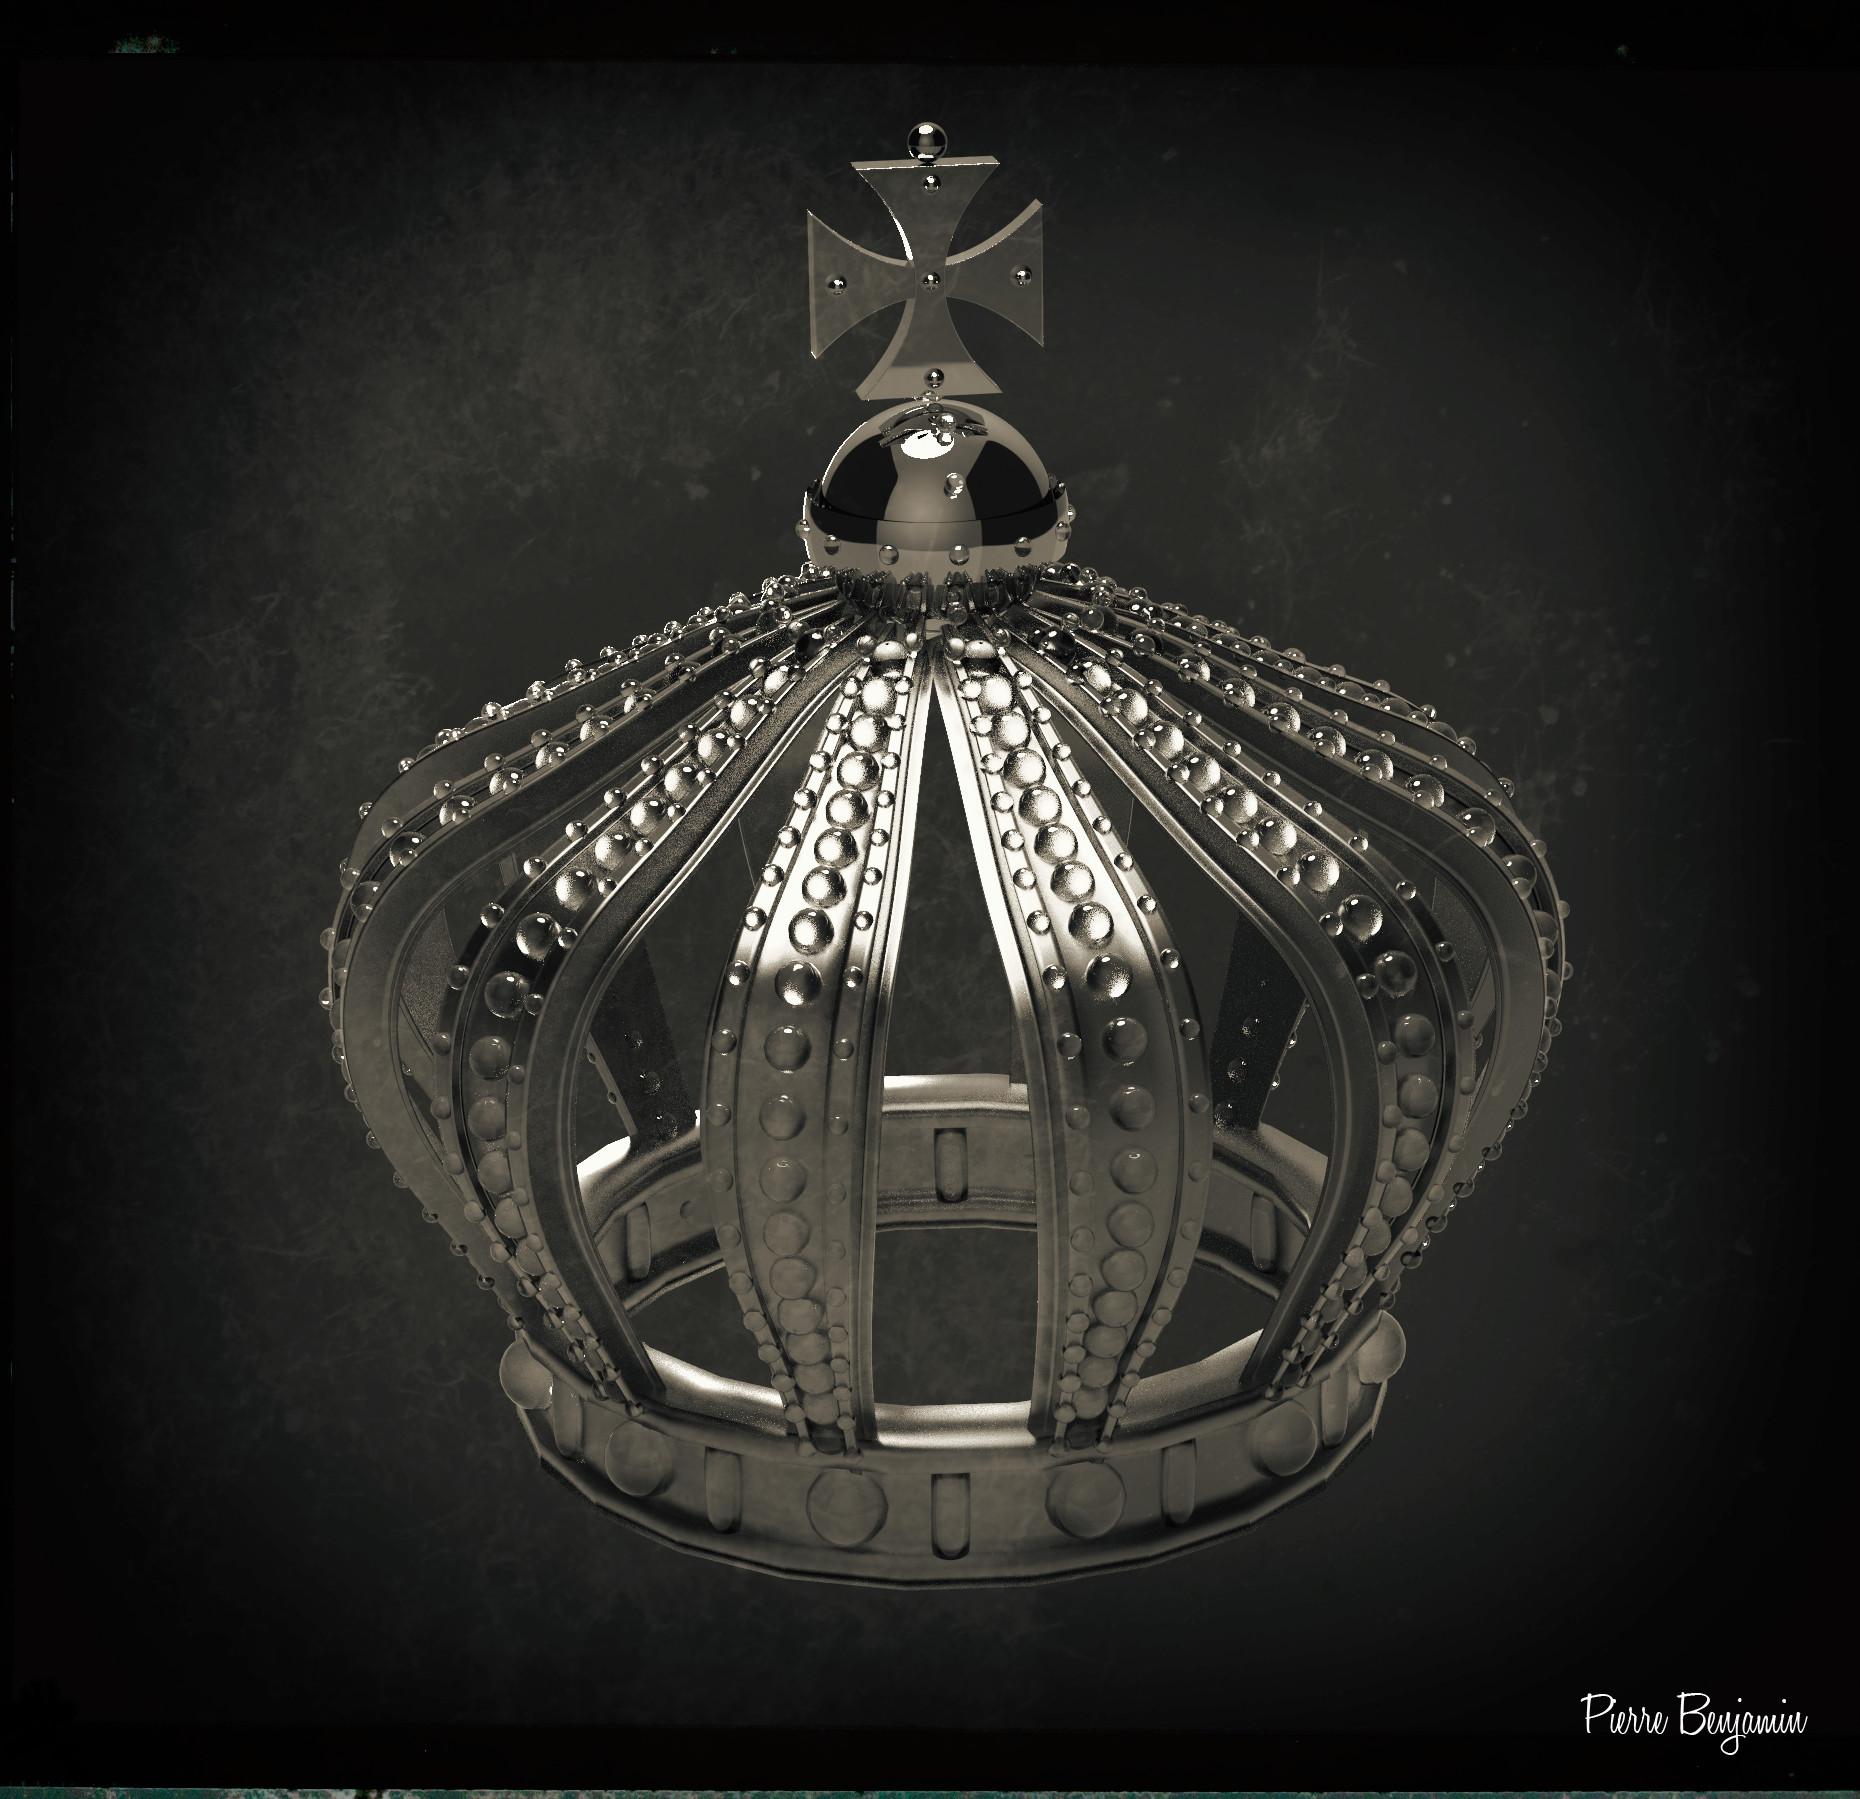 Pierre benjamin crown test render keyhshot 2442726ddsdsd